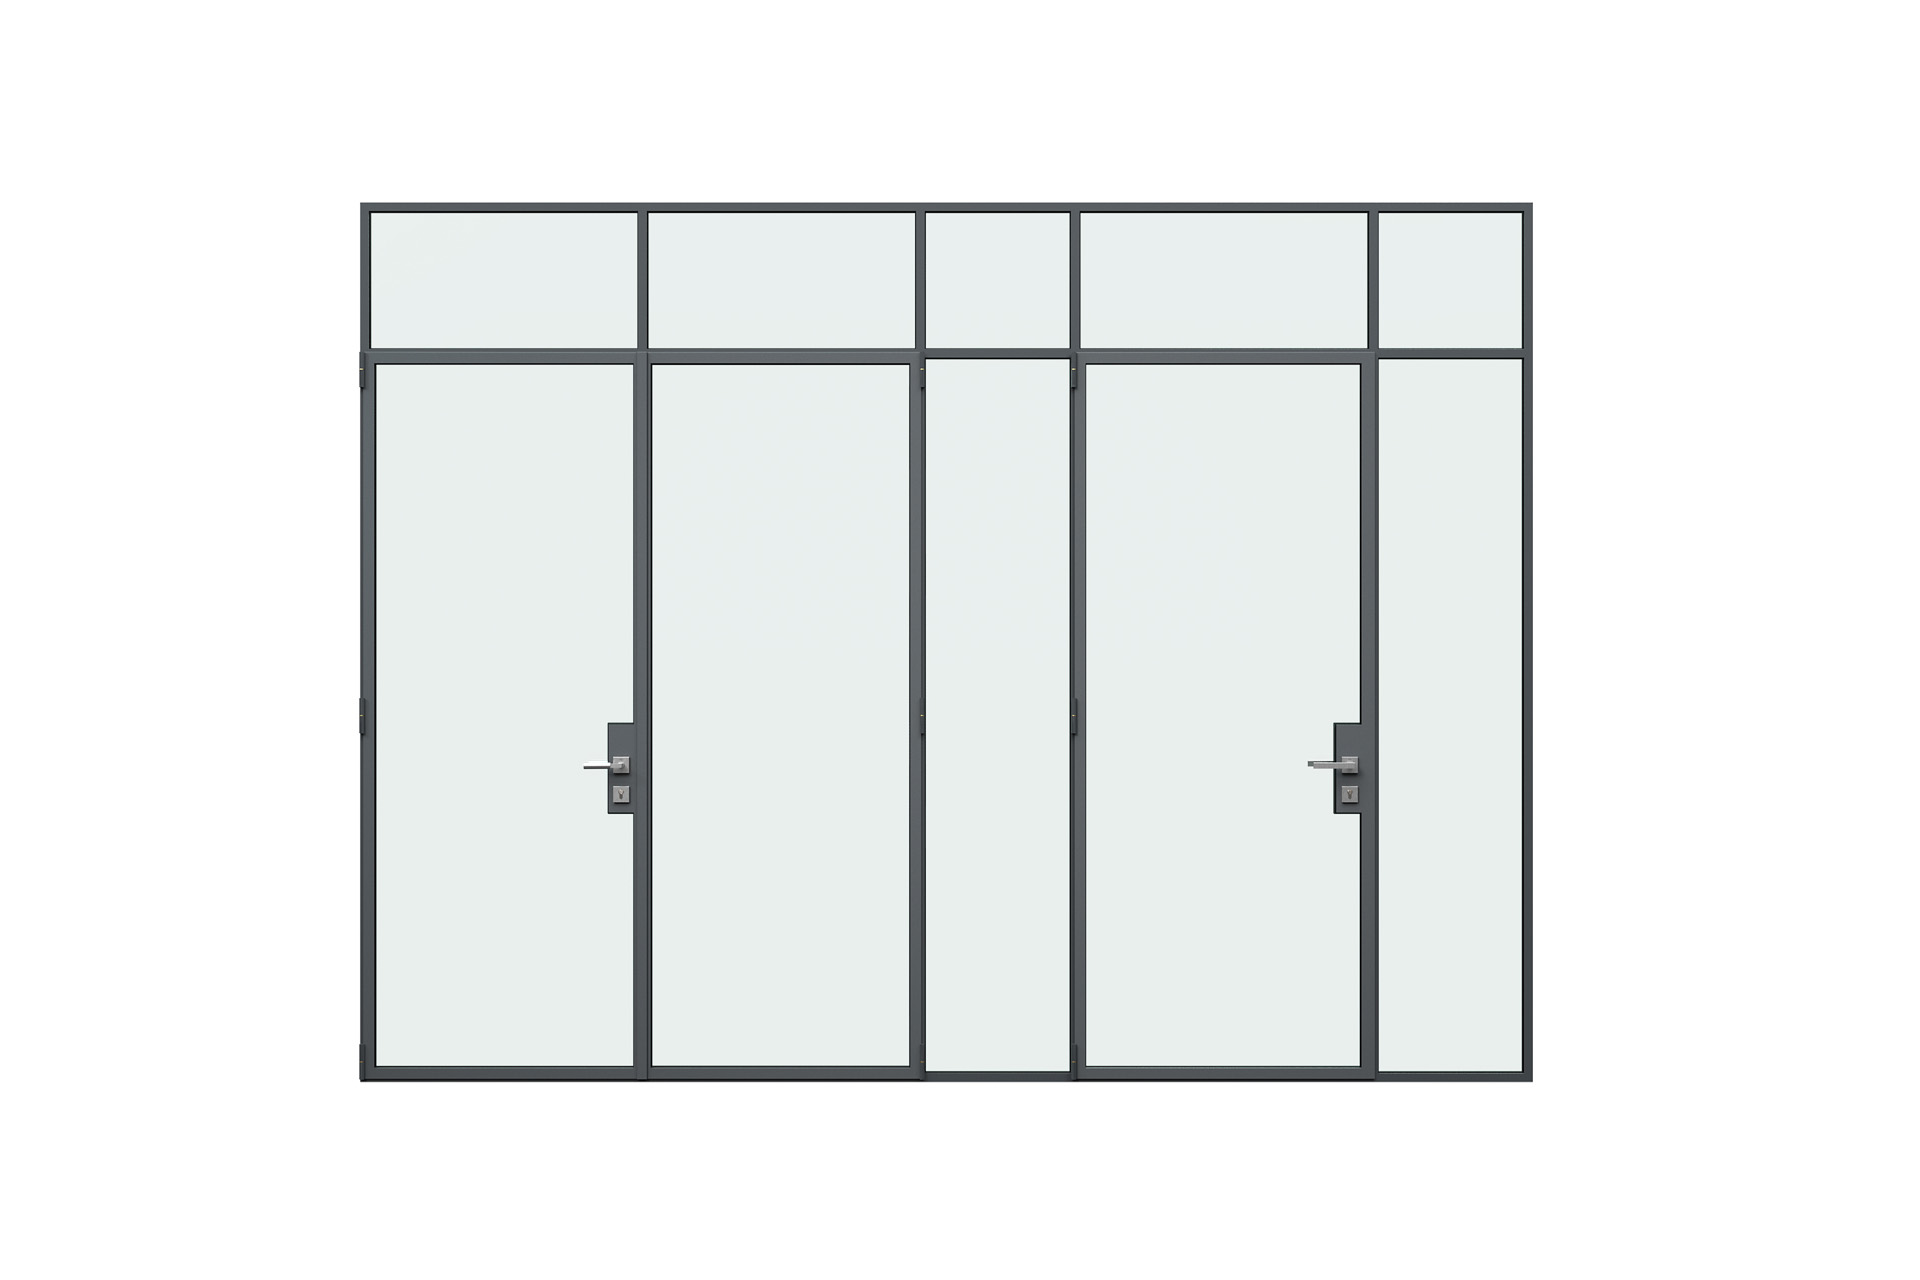 3d rendering front view of MHB steel Floating lock case doors